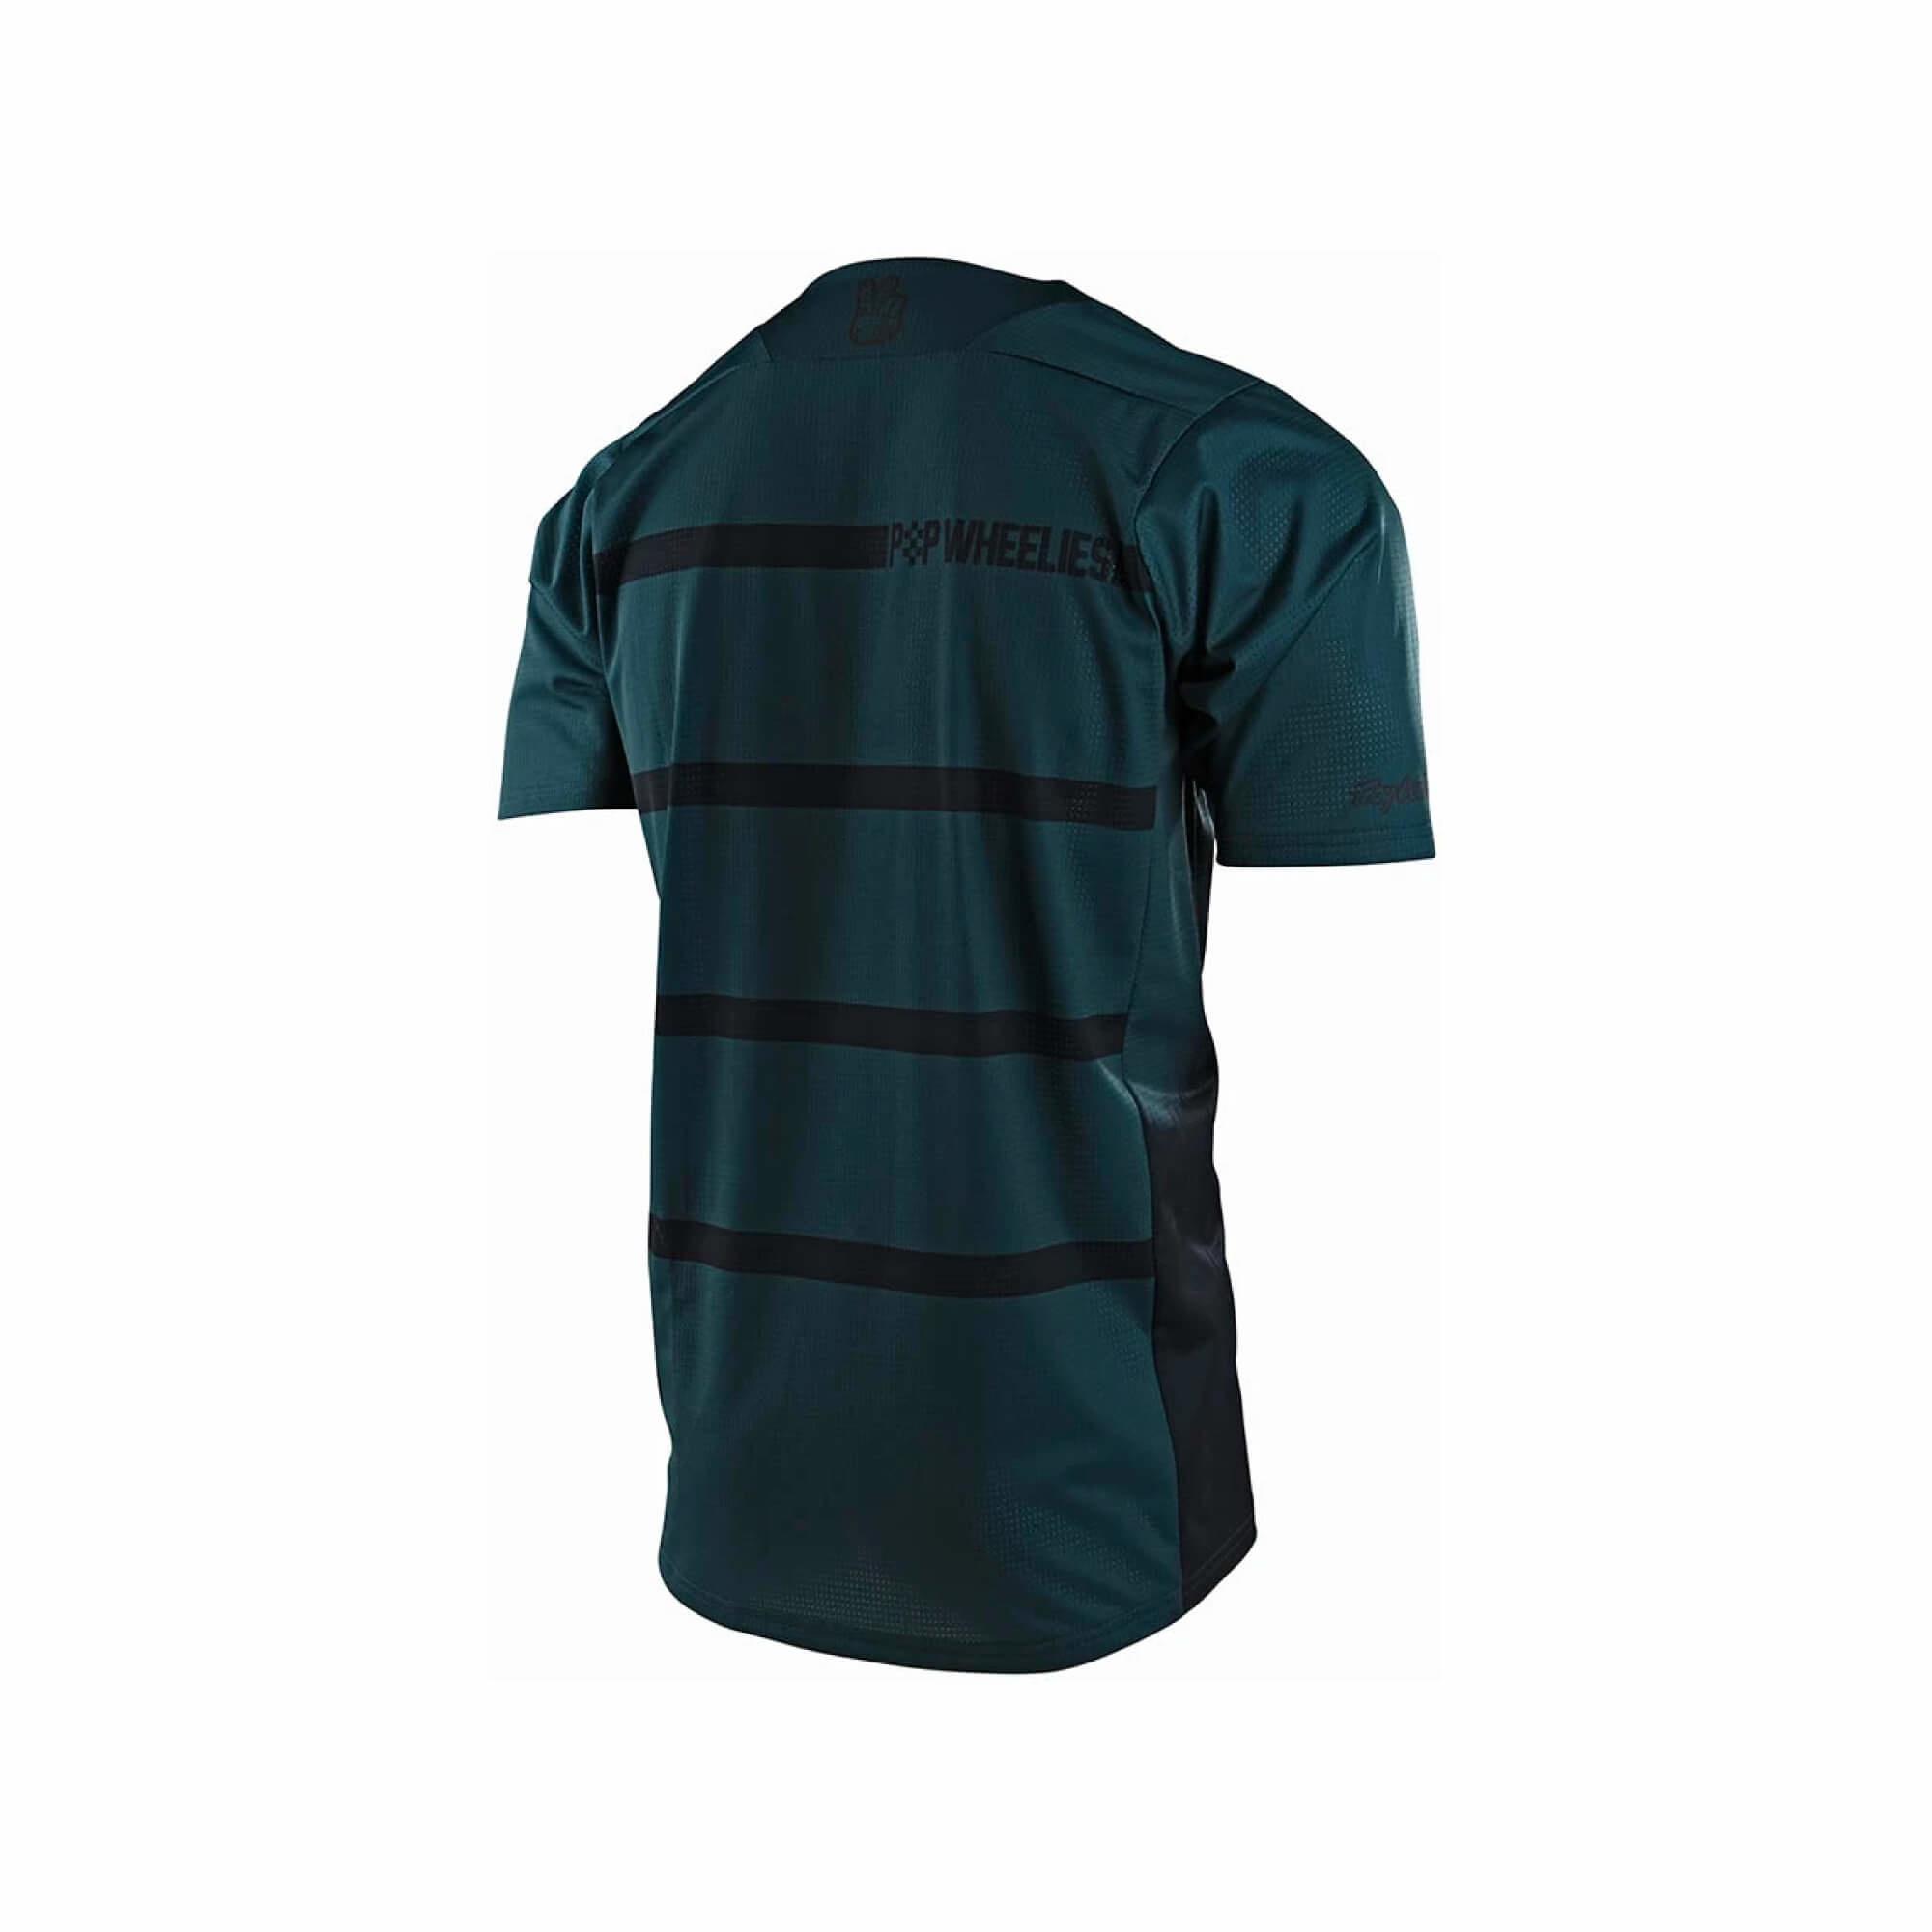 Skyline Short Sleeve Jersey 2021-4